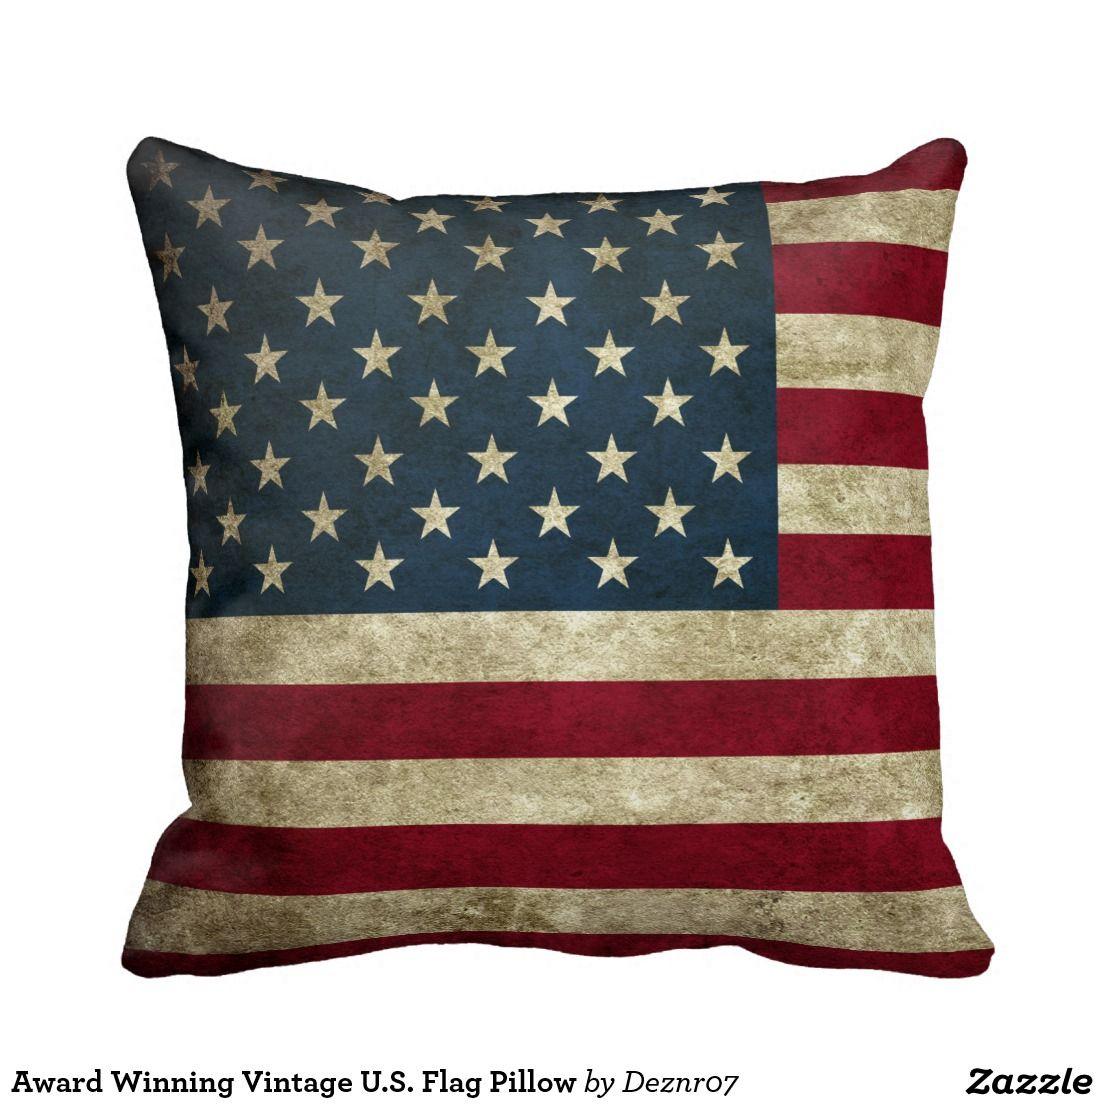 American Flag I Phones Wallpaper Is The Best High Resolution Phone Wallpaper In 2020 In 2020 American Flag Wallpaper American Flag Wallpaper Iphone Usa Flag Wallpaper